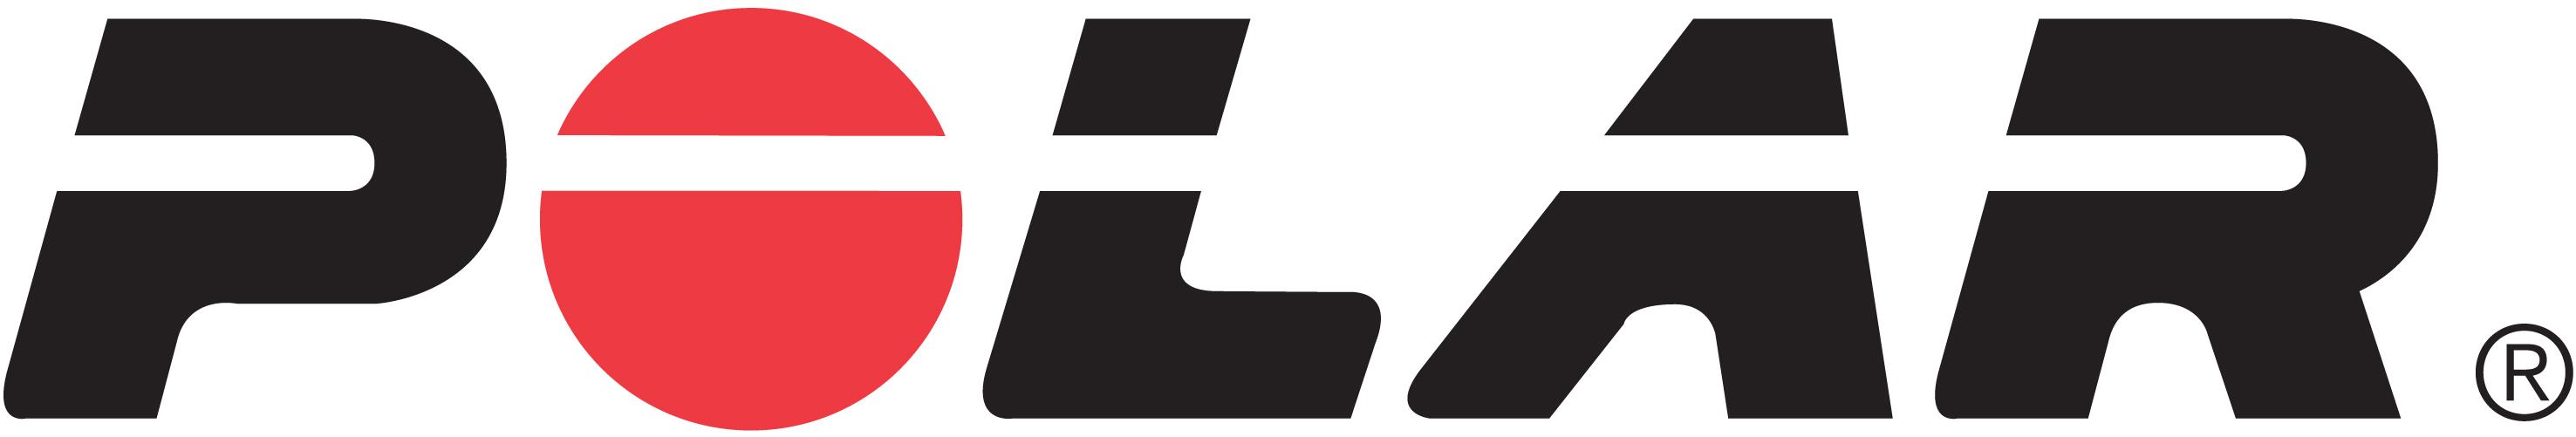 Polar logo wallpapers HD